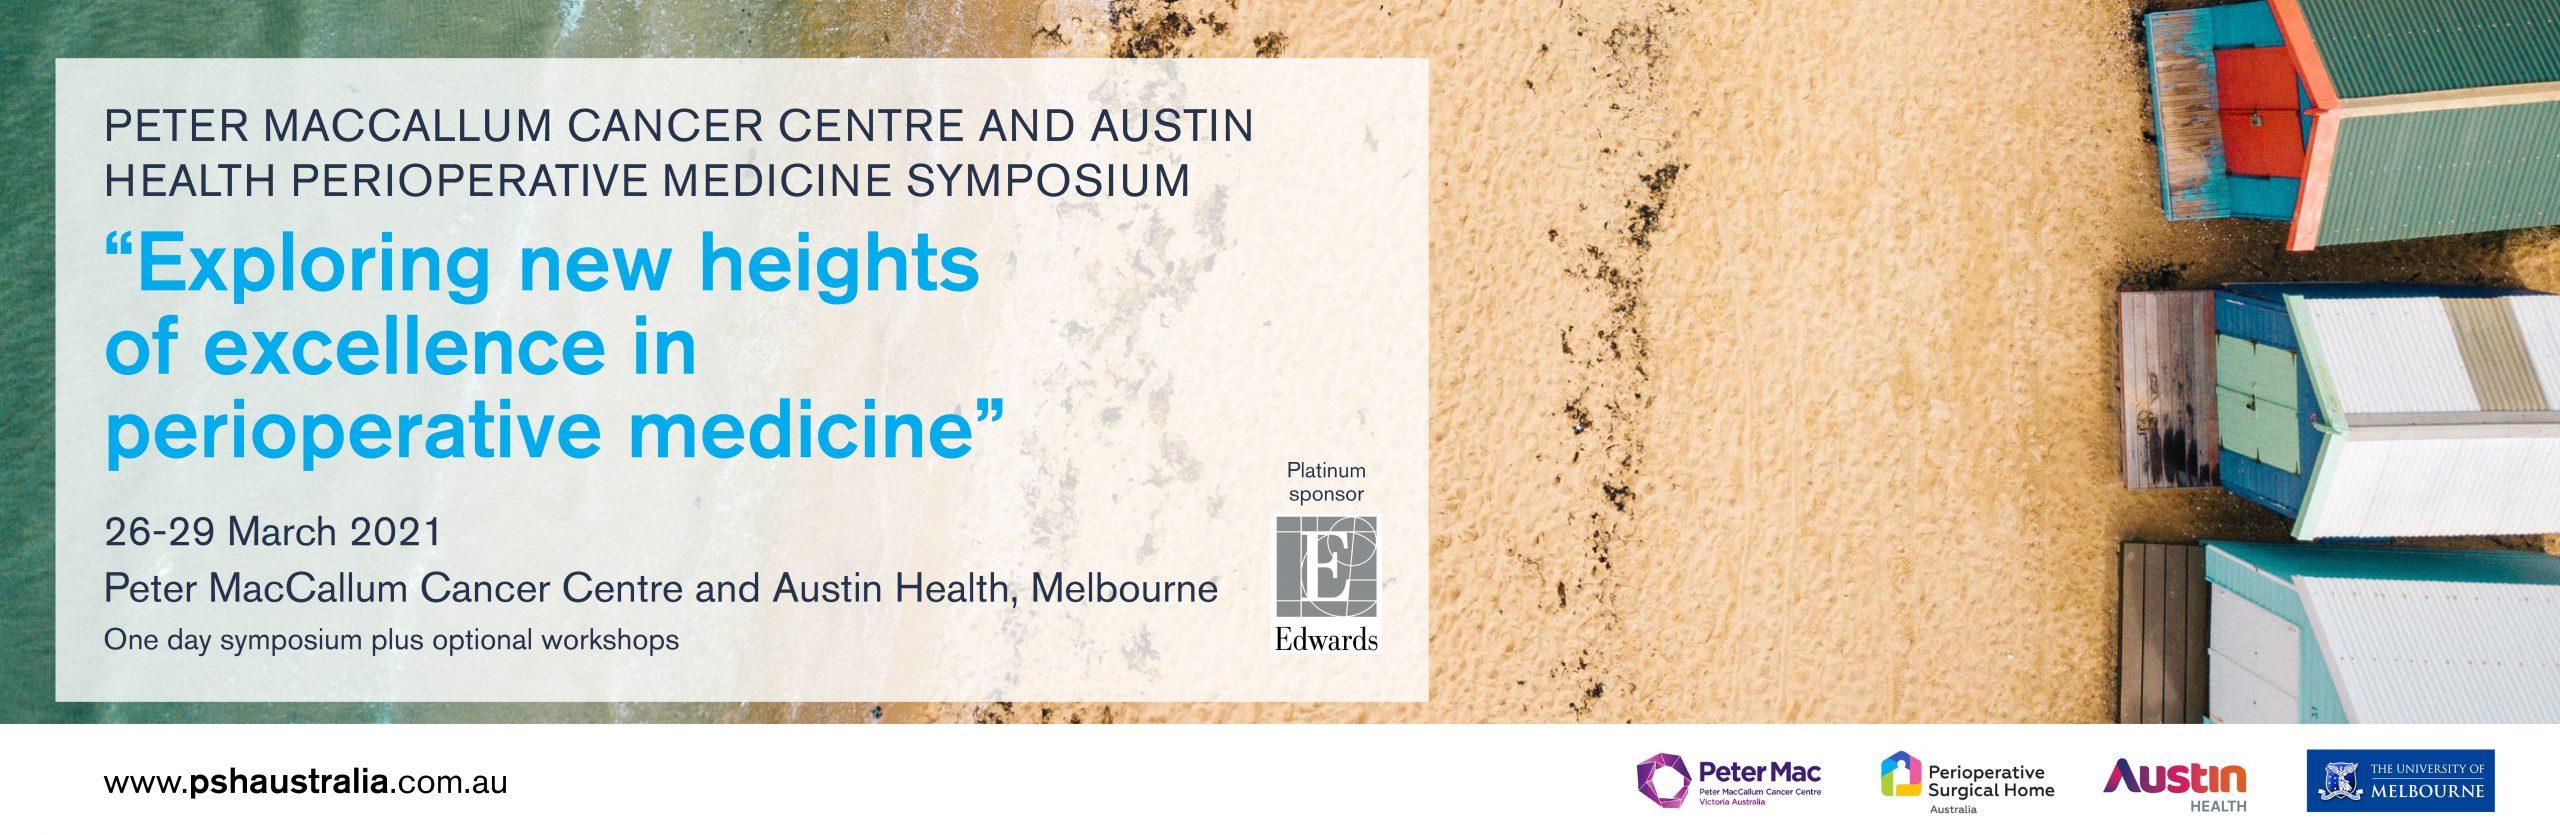 Peter MacCallum Cancer Centre and Austin Health Perioperative Medicine Symposium